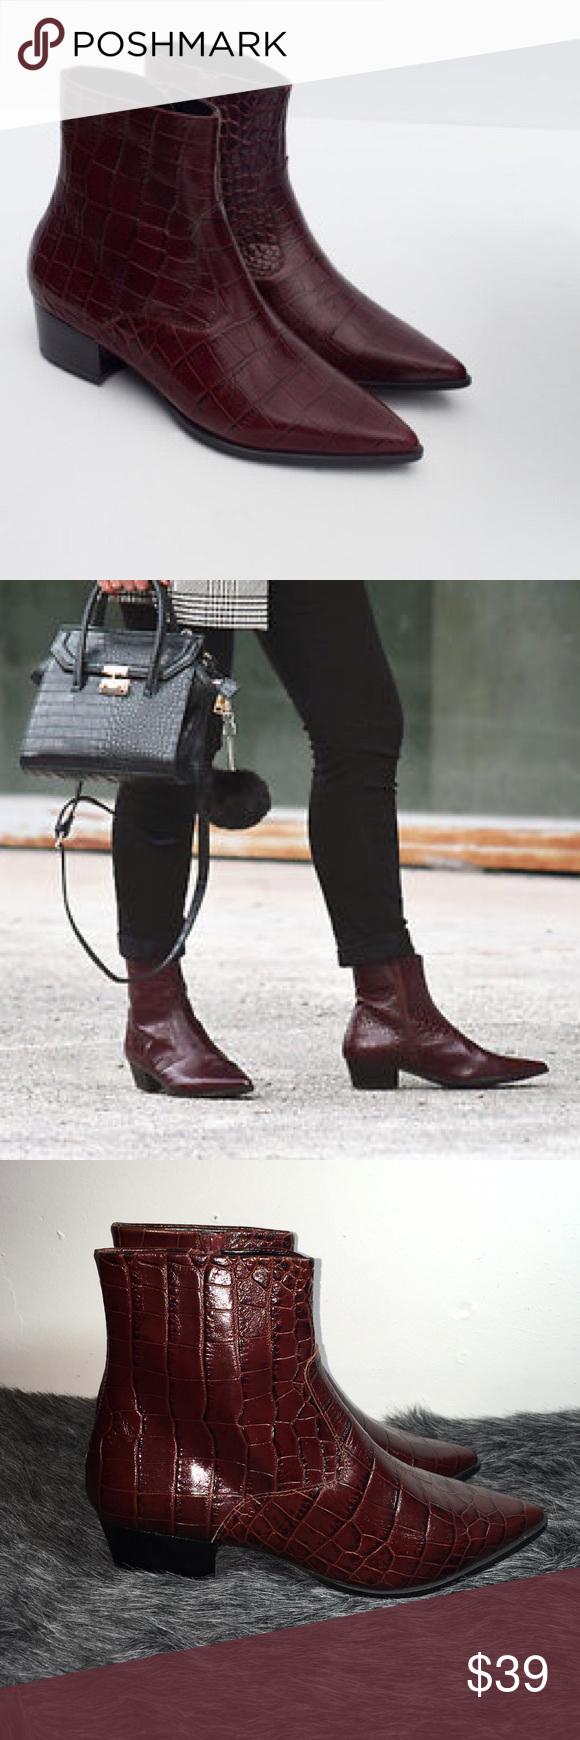 Zara Cowboy Leather Mock Croc Boots UK6 EUR39 US8 RRP £99.99